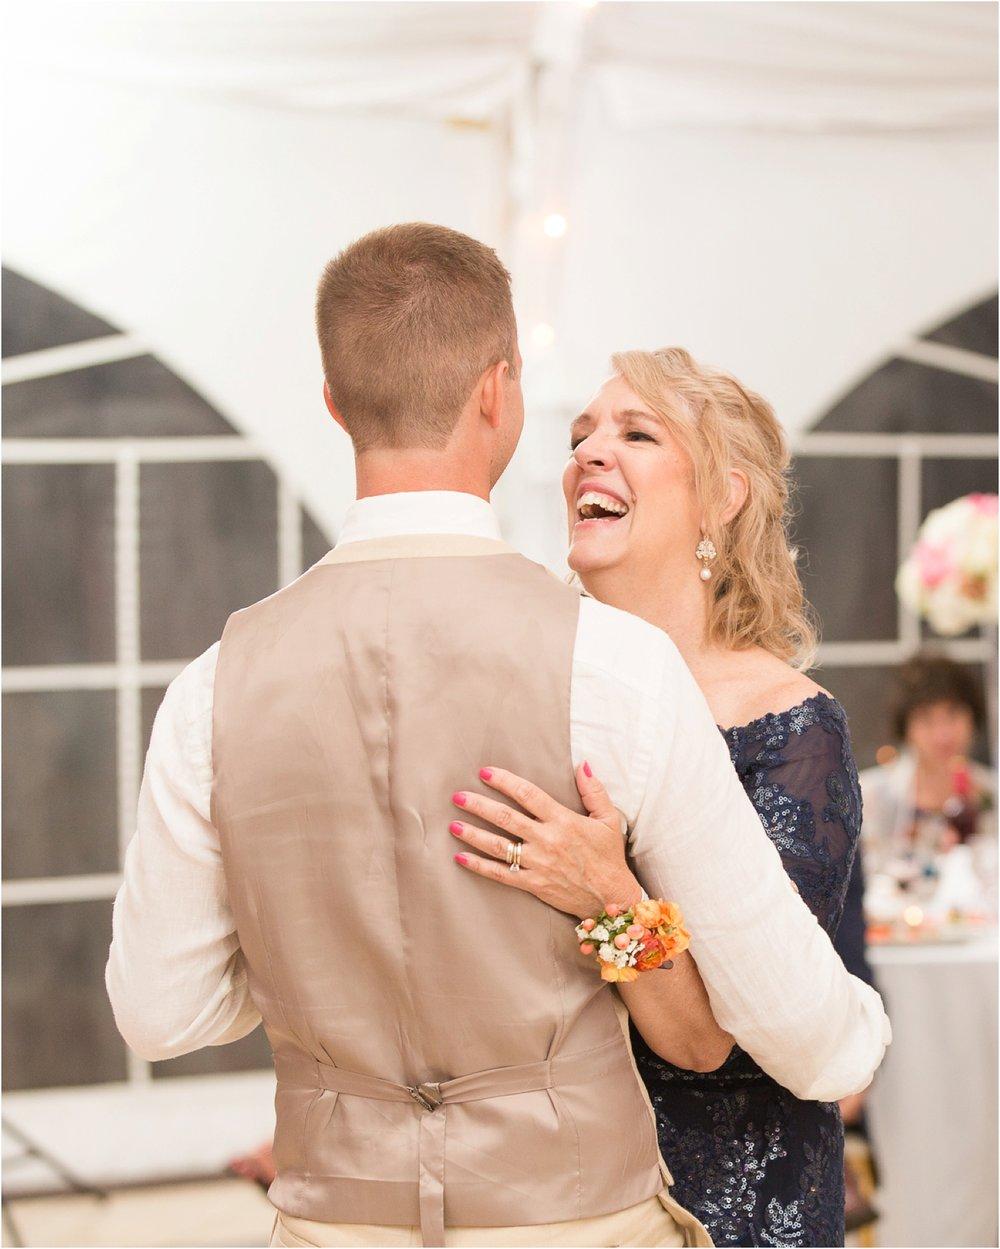 Celebrations-at-the-bay-wedding-photos-93.jpg